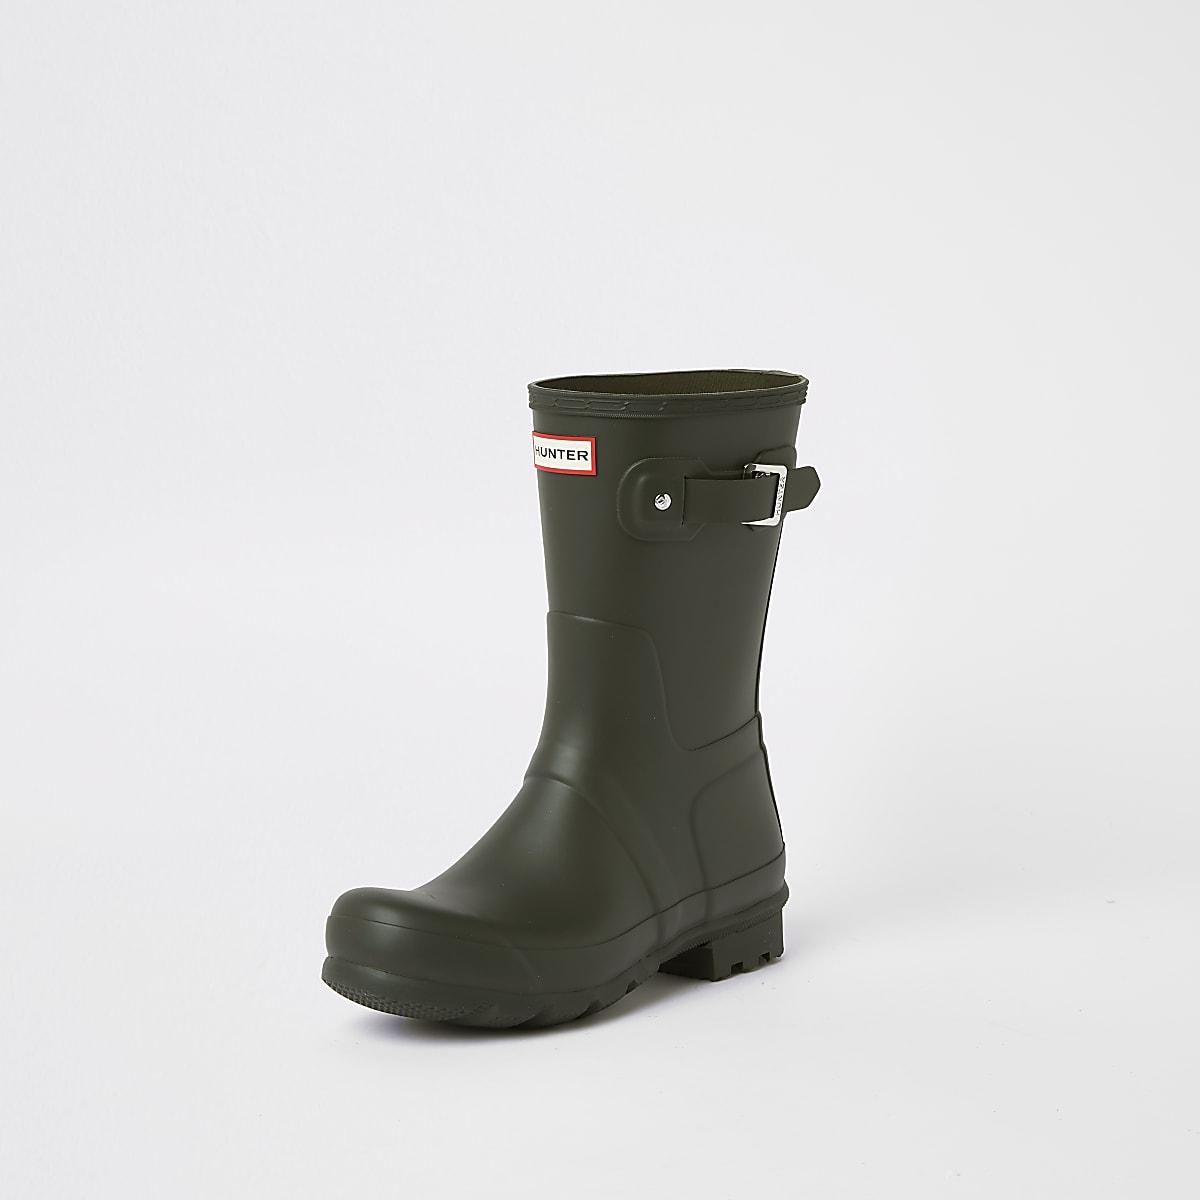 quality design 964e7 2c655 Hunter Original green short wellington boots